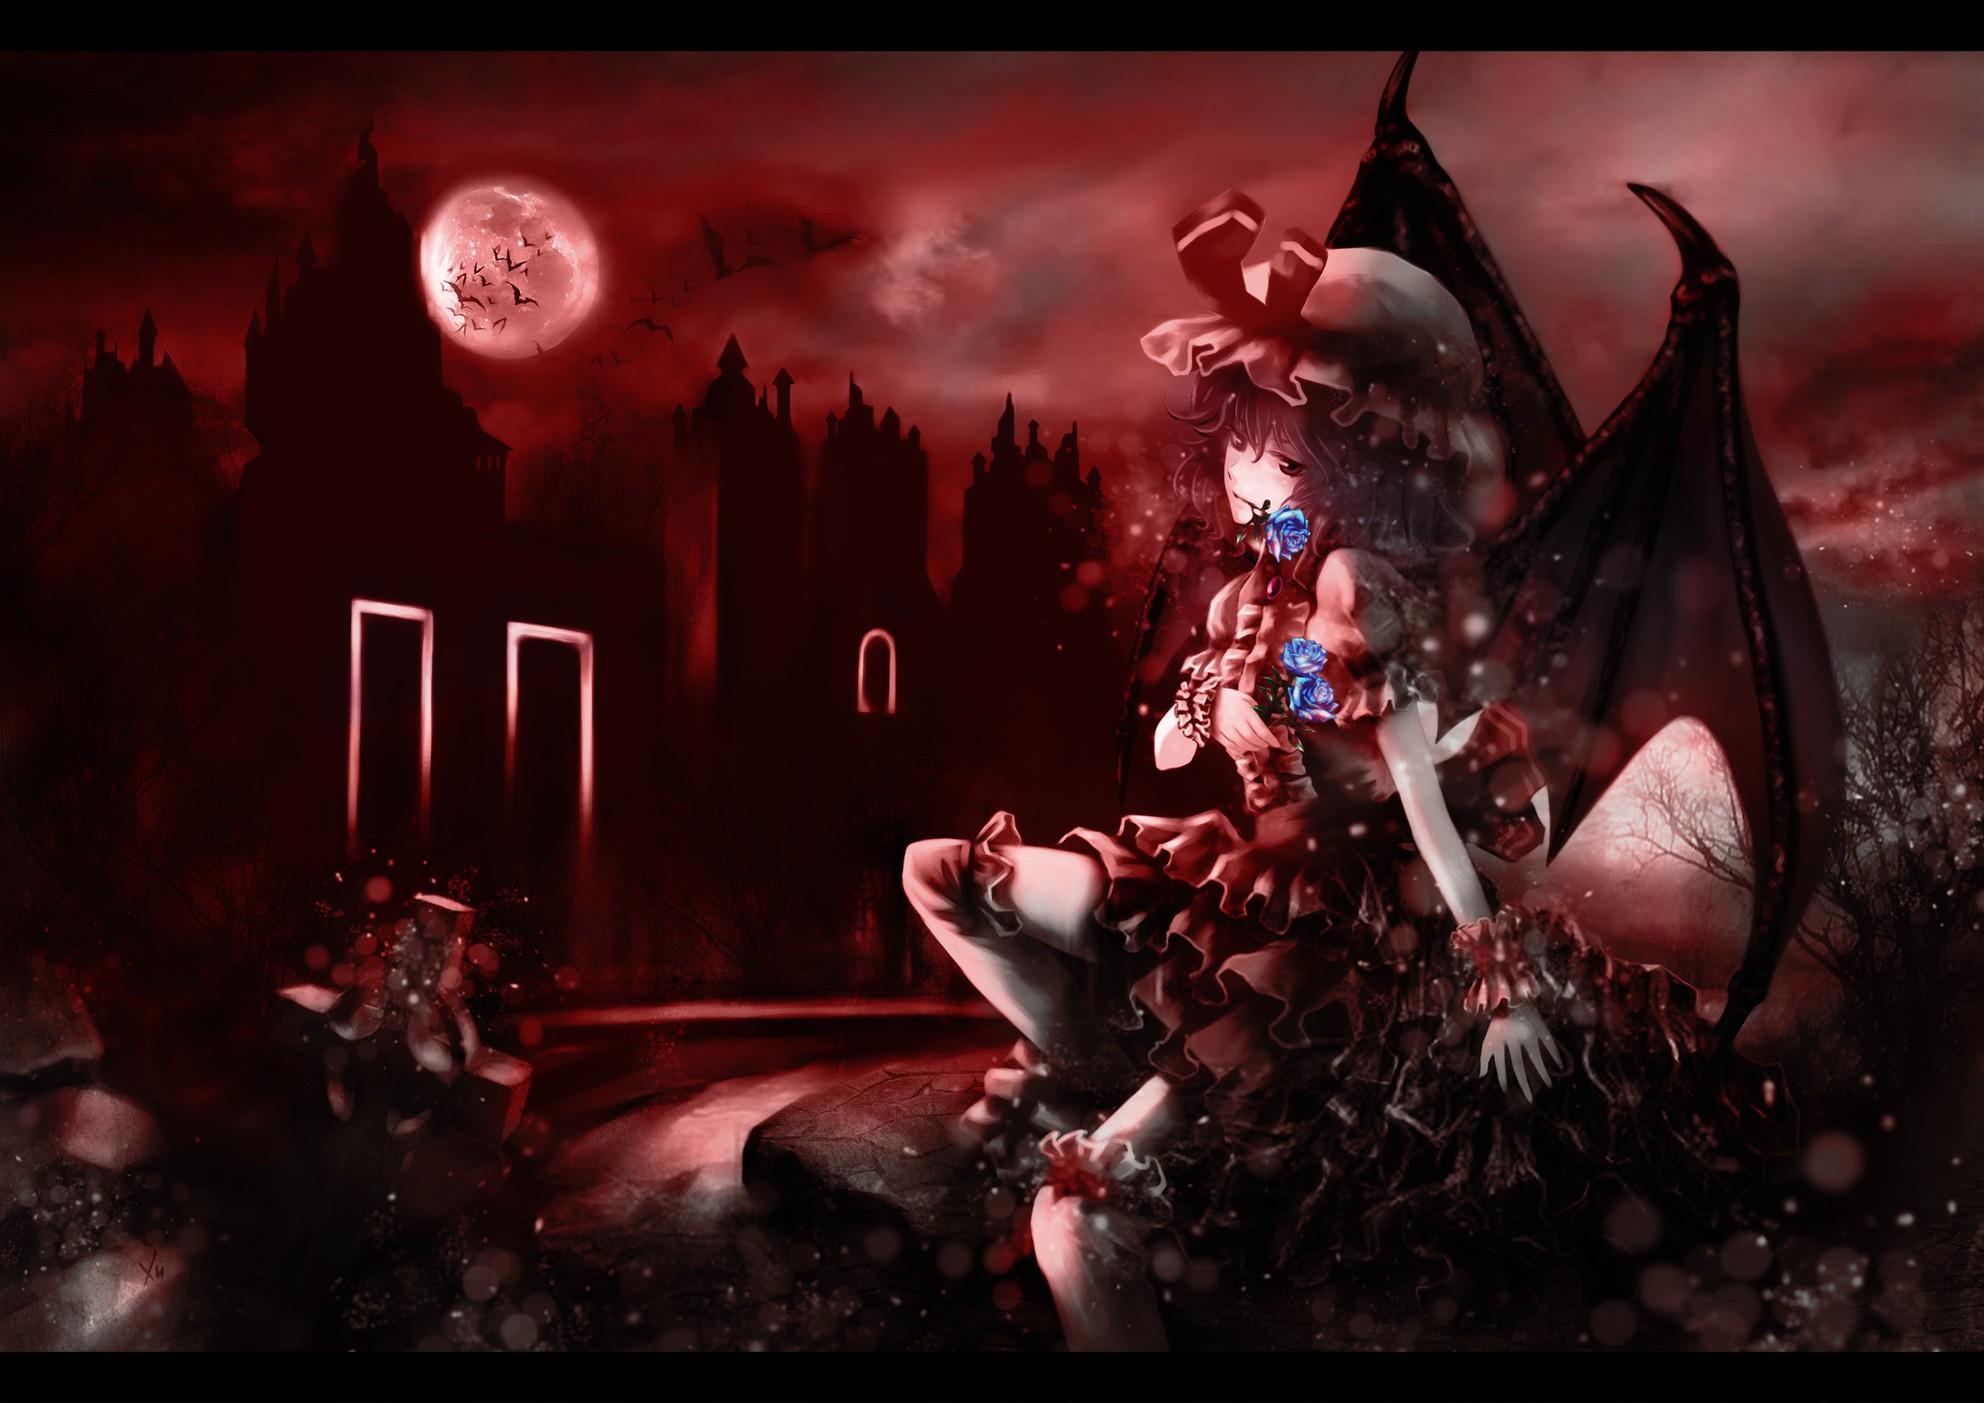 Anime - Touhou  Remilia Scarlet Wallpaper